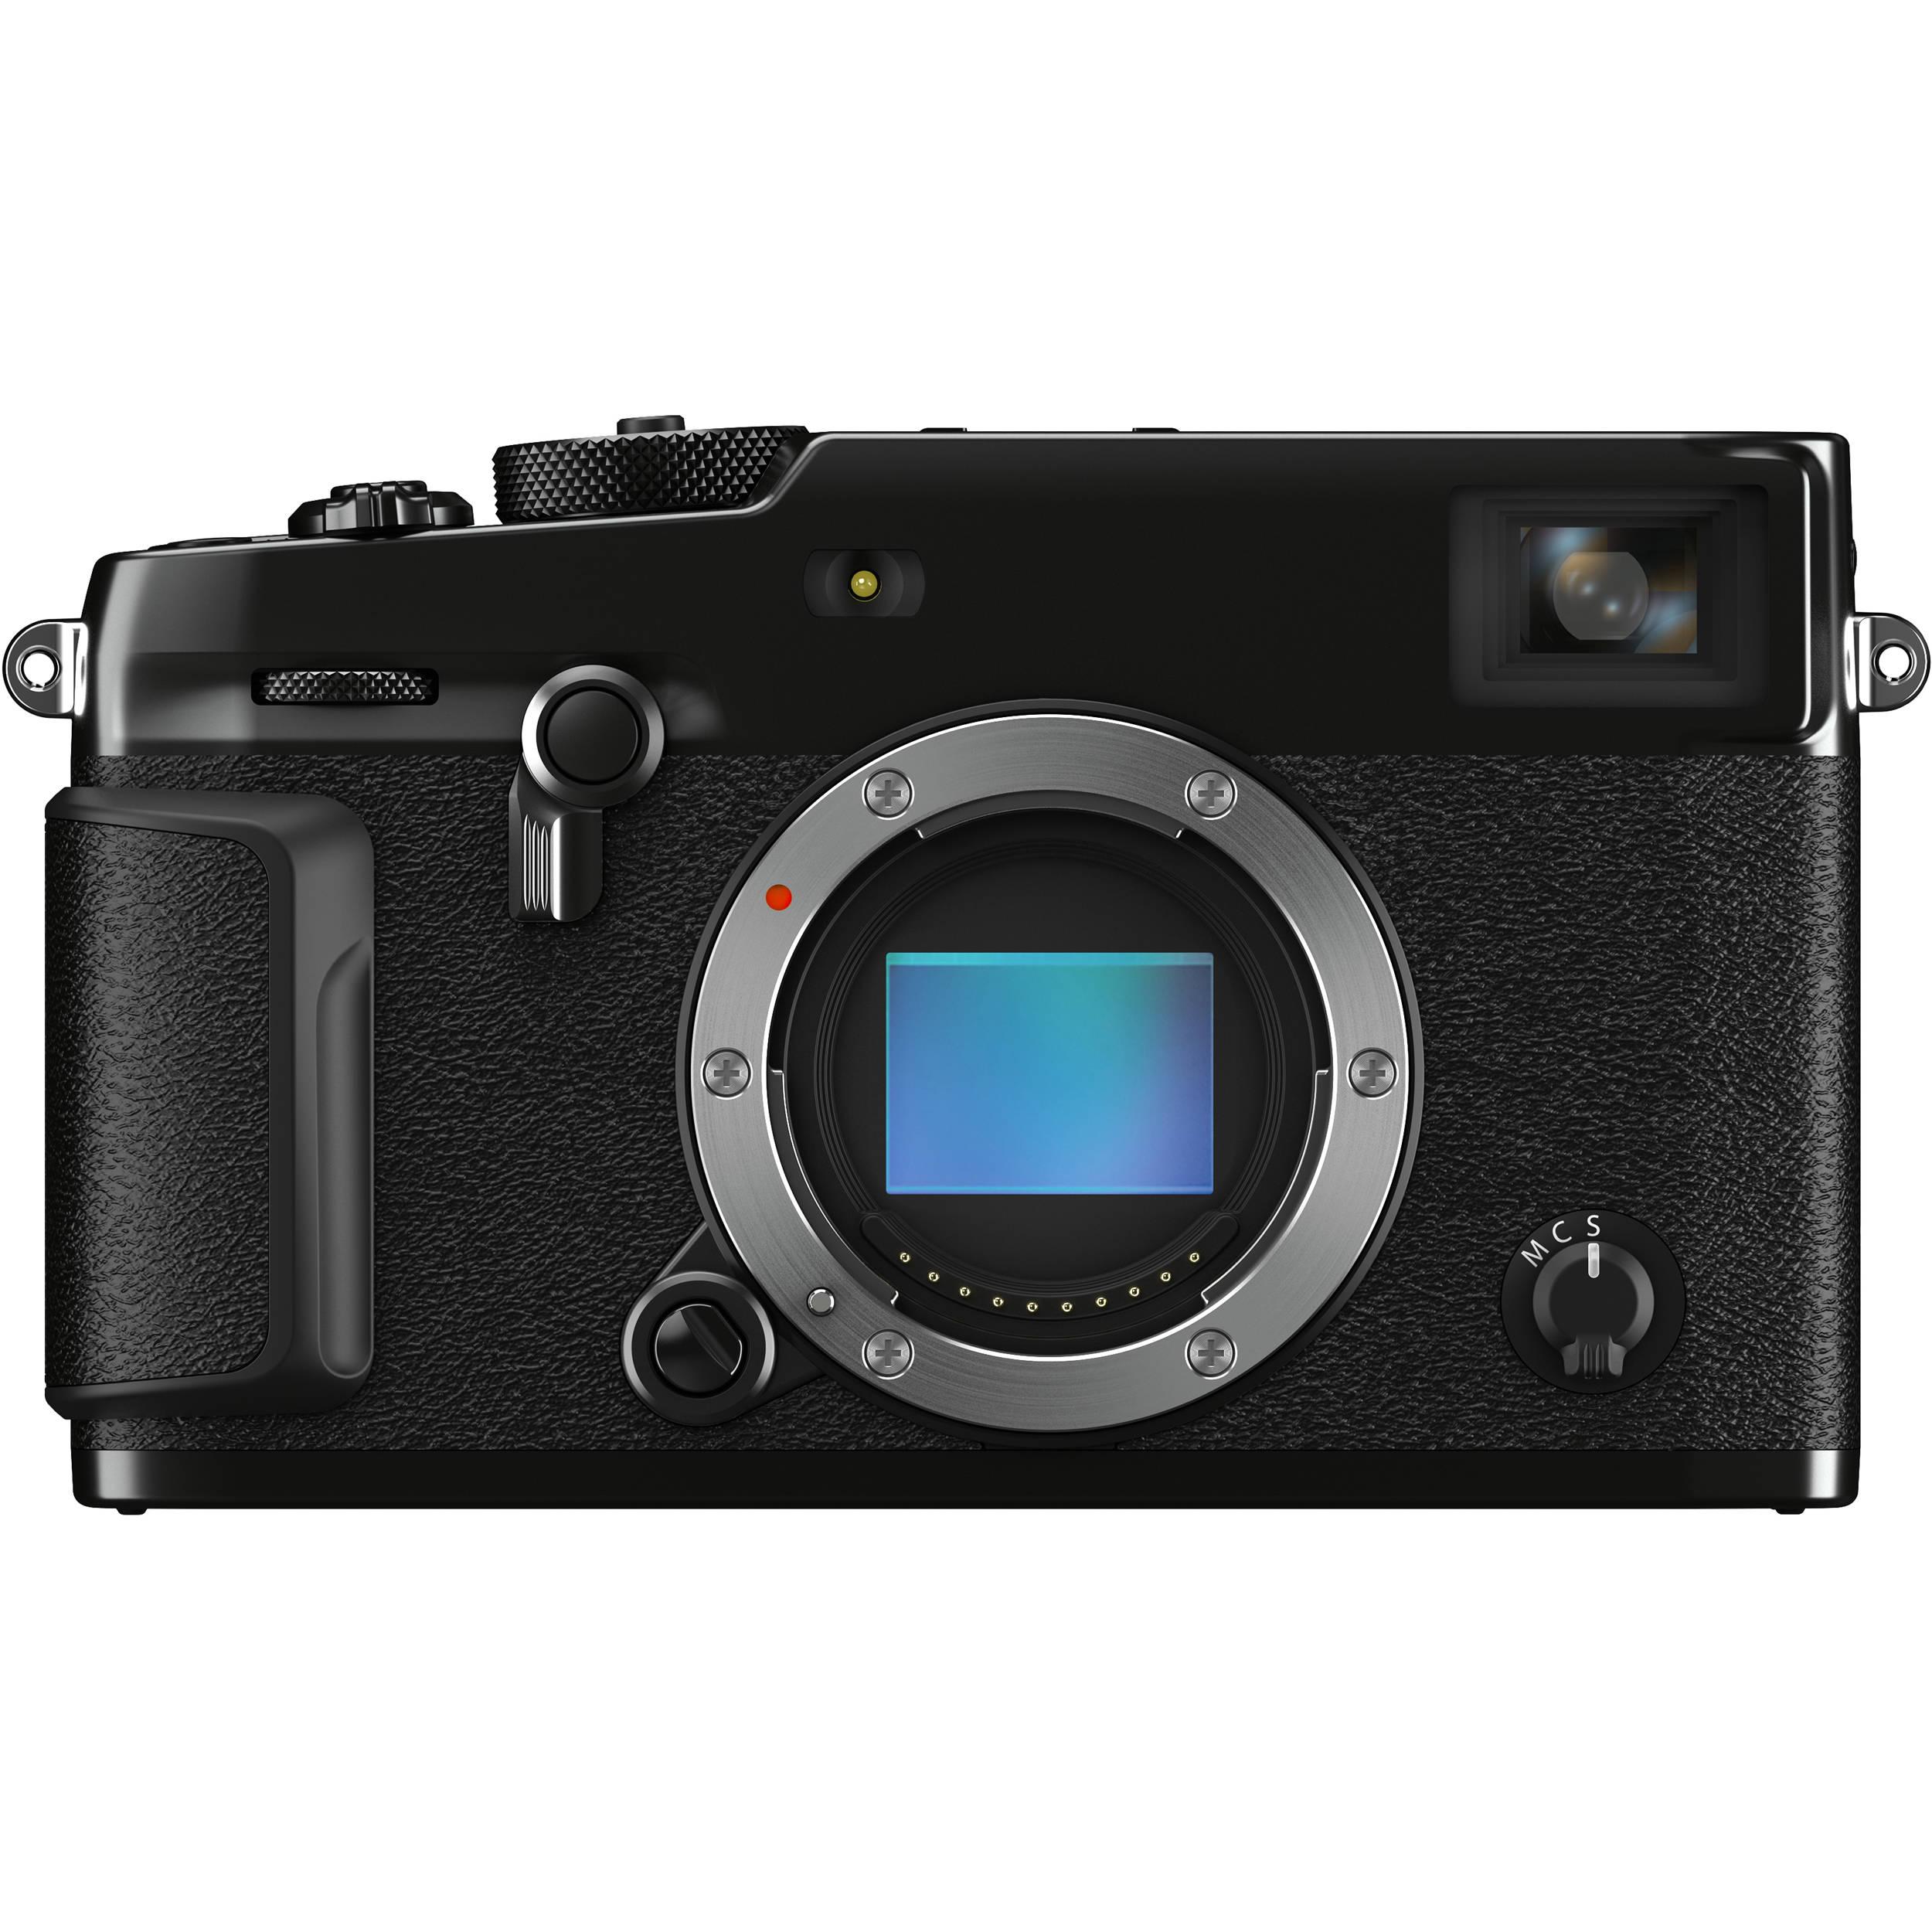 Fuji Xpro3 Fujifilm X Pro3 Mirrorless Digital Camera X Pro3 Black B H Photo